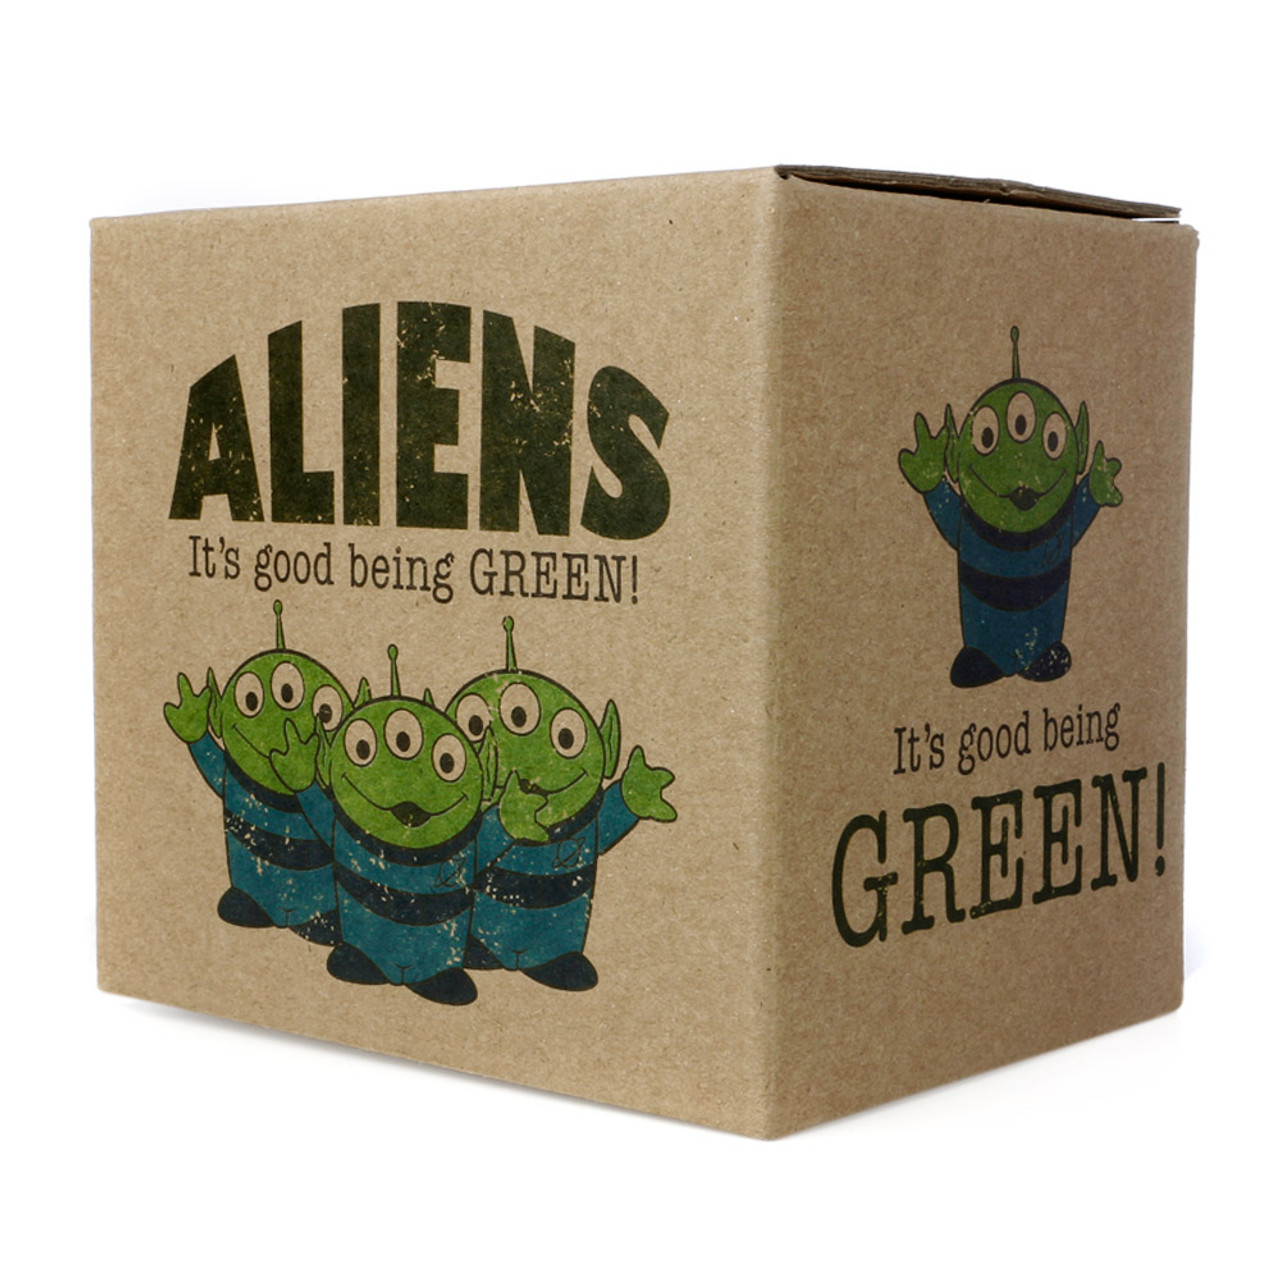 Disney Toy Story Green Aliens Milky Mug ( Box View )